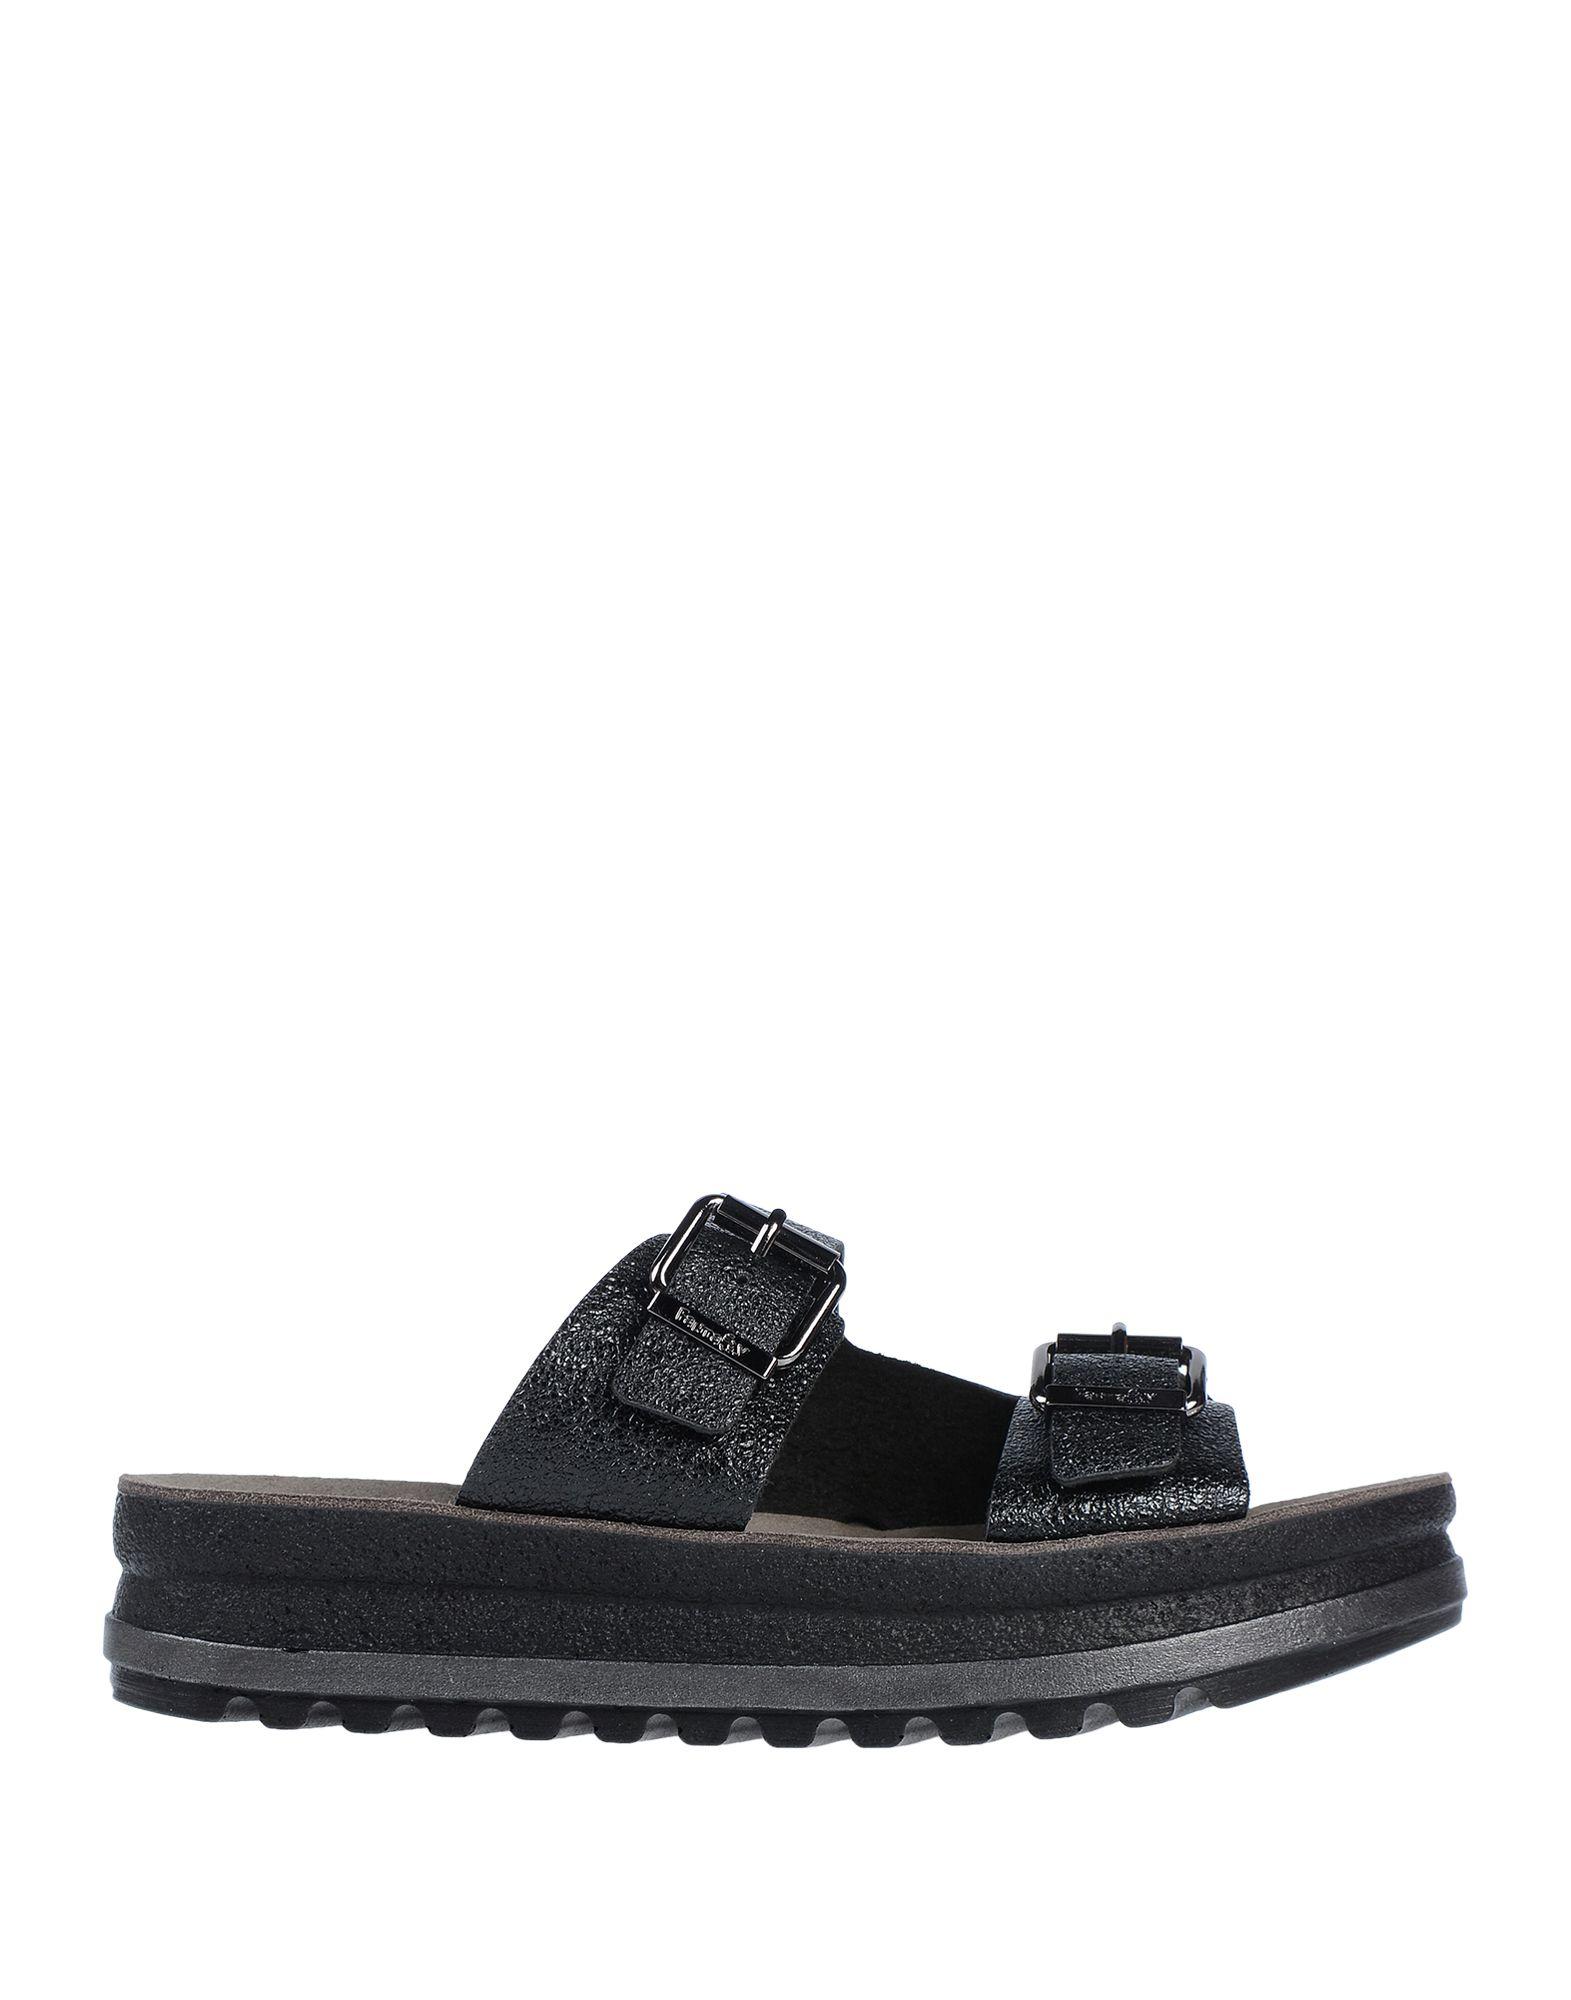 FANTASY SANDALS Сандалии 2018 women sandals flat with shoes bandage bohemia leisure lady sandals peep toe outdoor women s summer footwear shoes 3 27